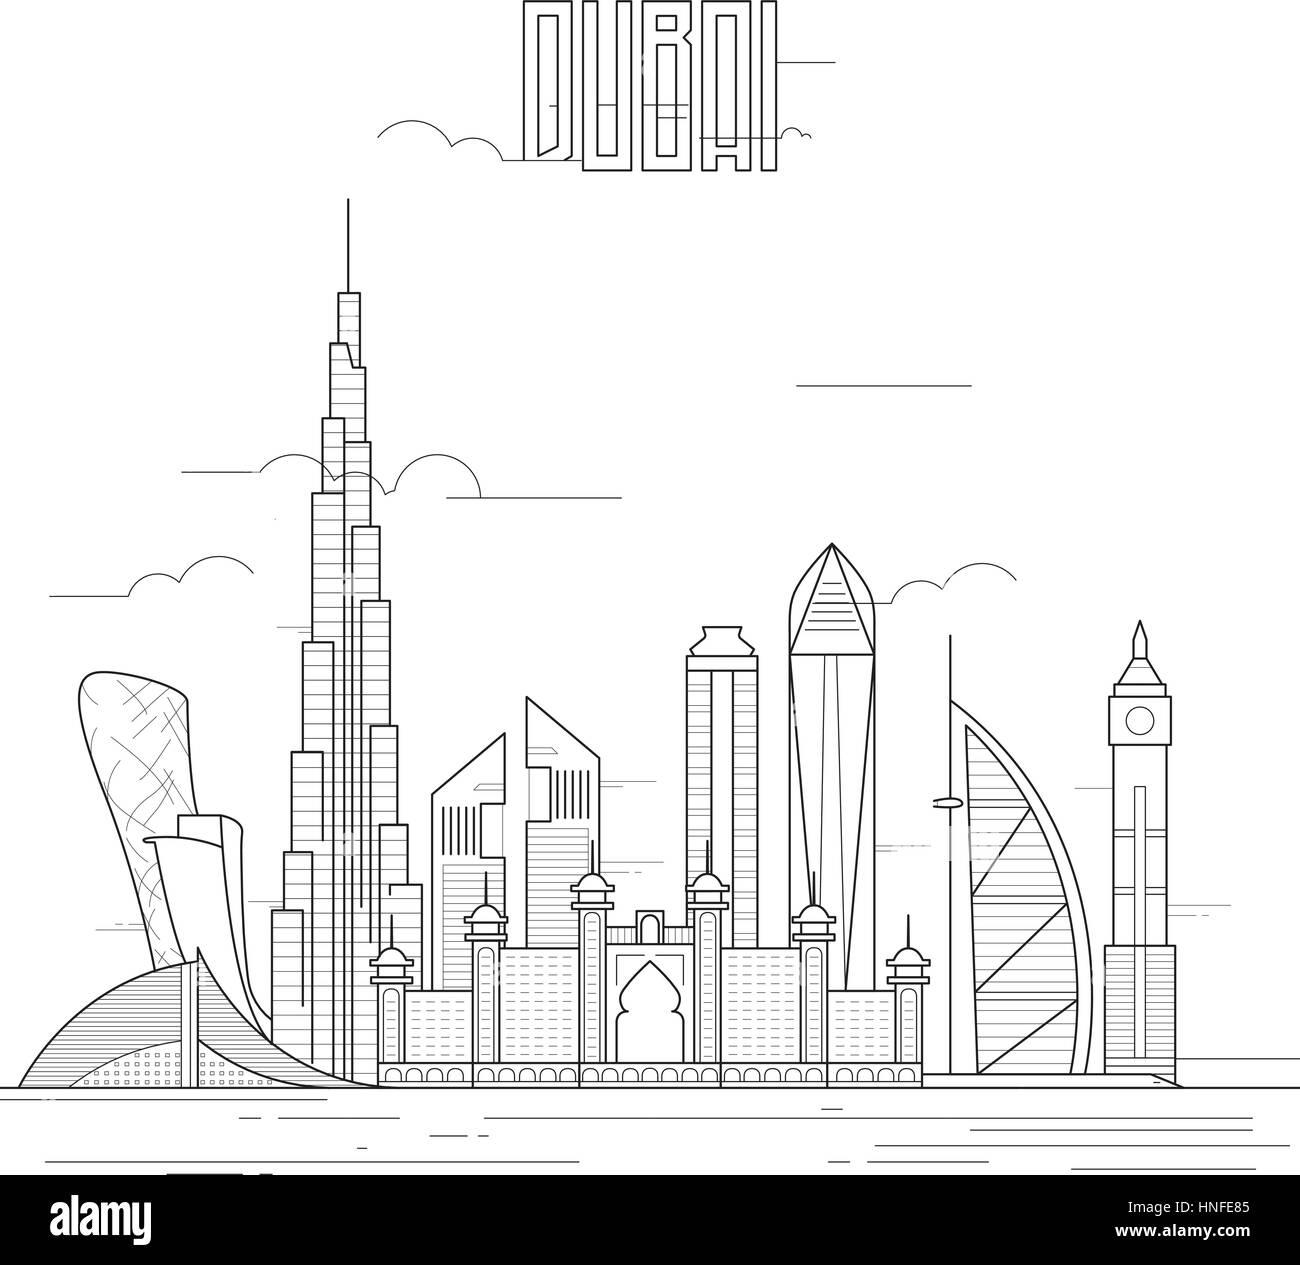 Dubai City With Iconic Buildings Line Art Flat Design